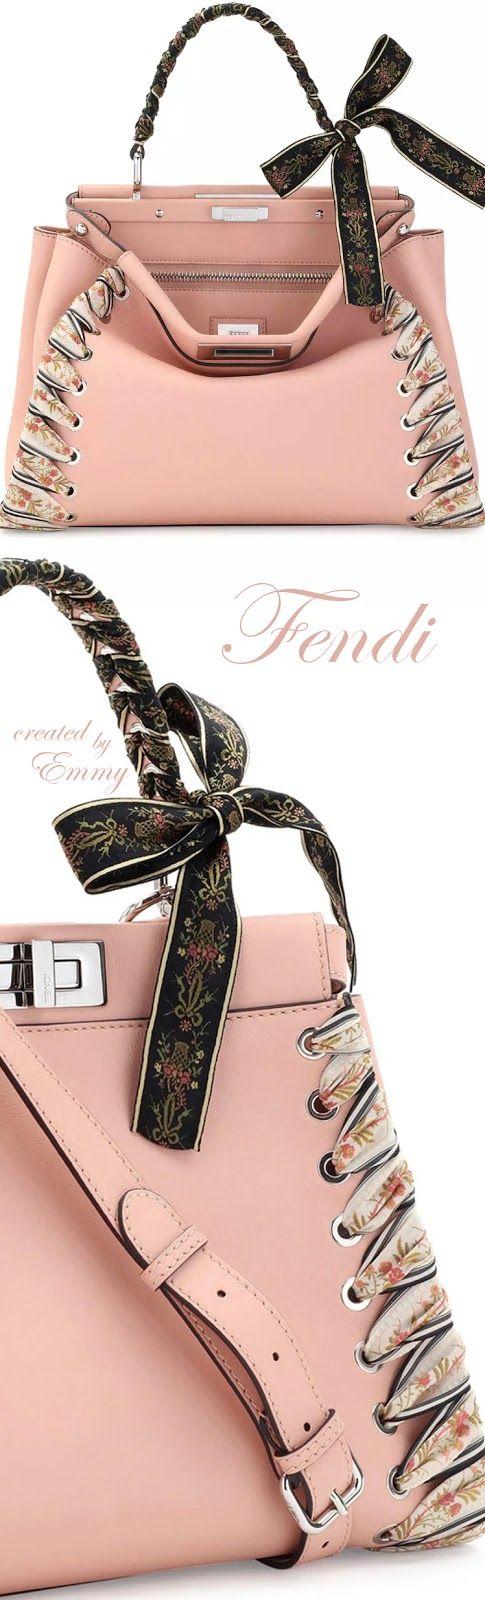 Brilliant Luxury♦Fendi Candy Colours Spring 2017♦Peekaboo Medium Ribbon Whipstitch Satchel Bag in Light Pink